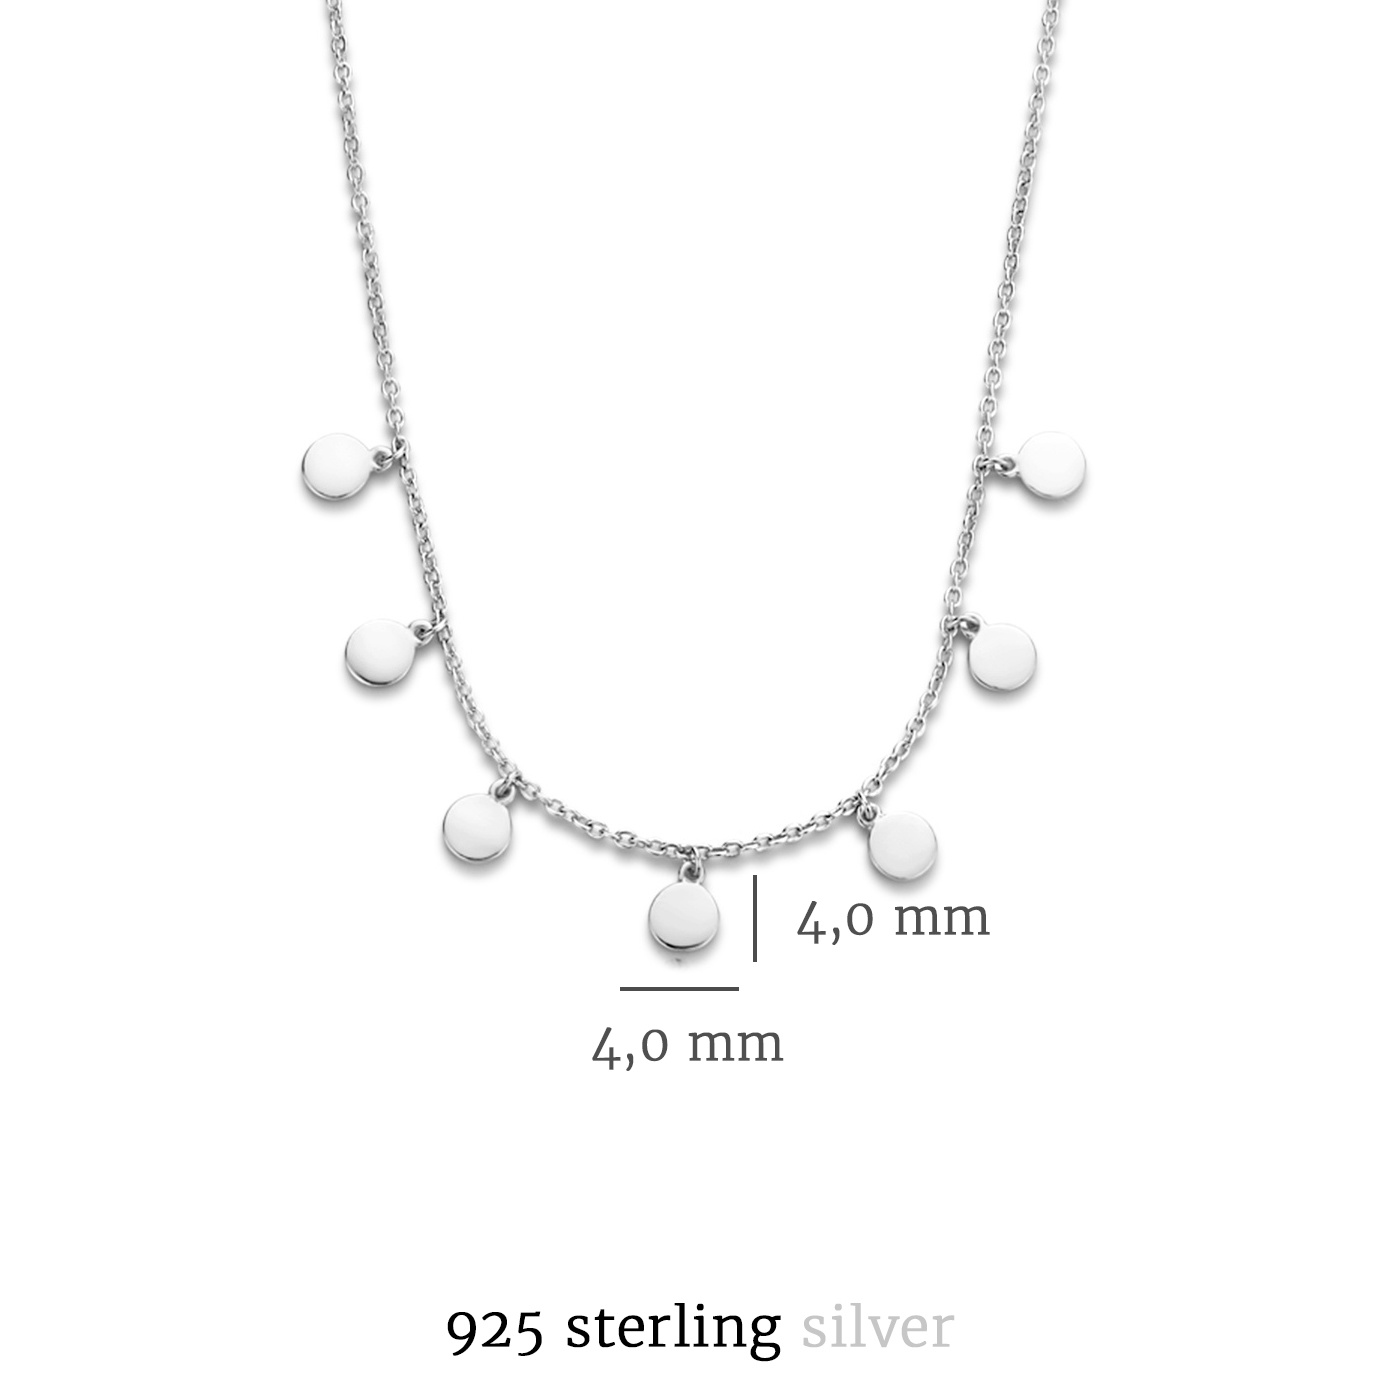 Selected Jewels Julie Belle collana in argento sterling 925